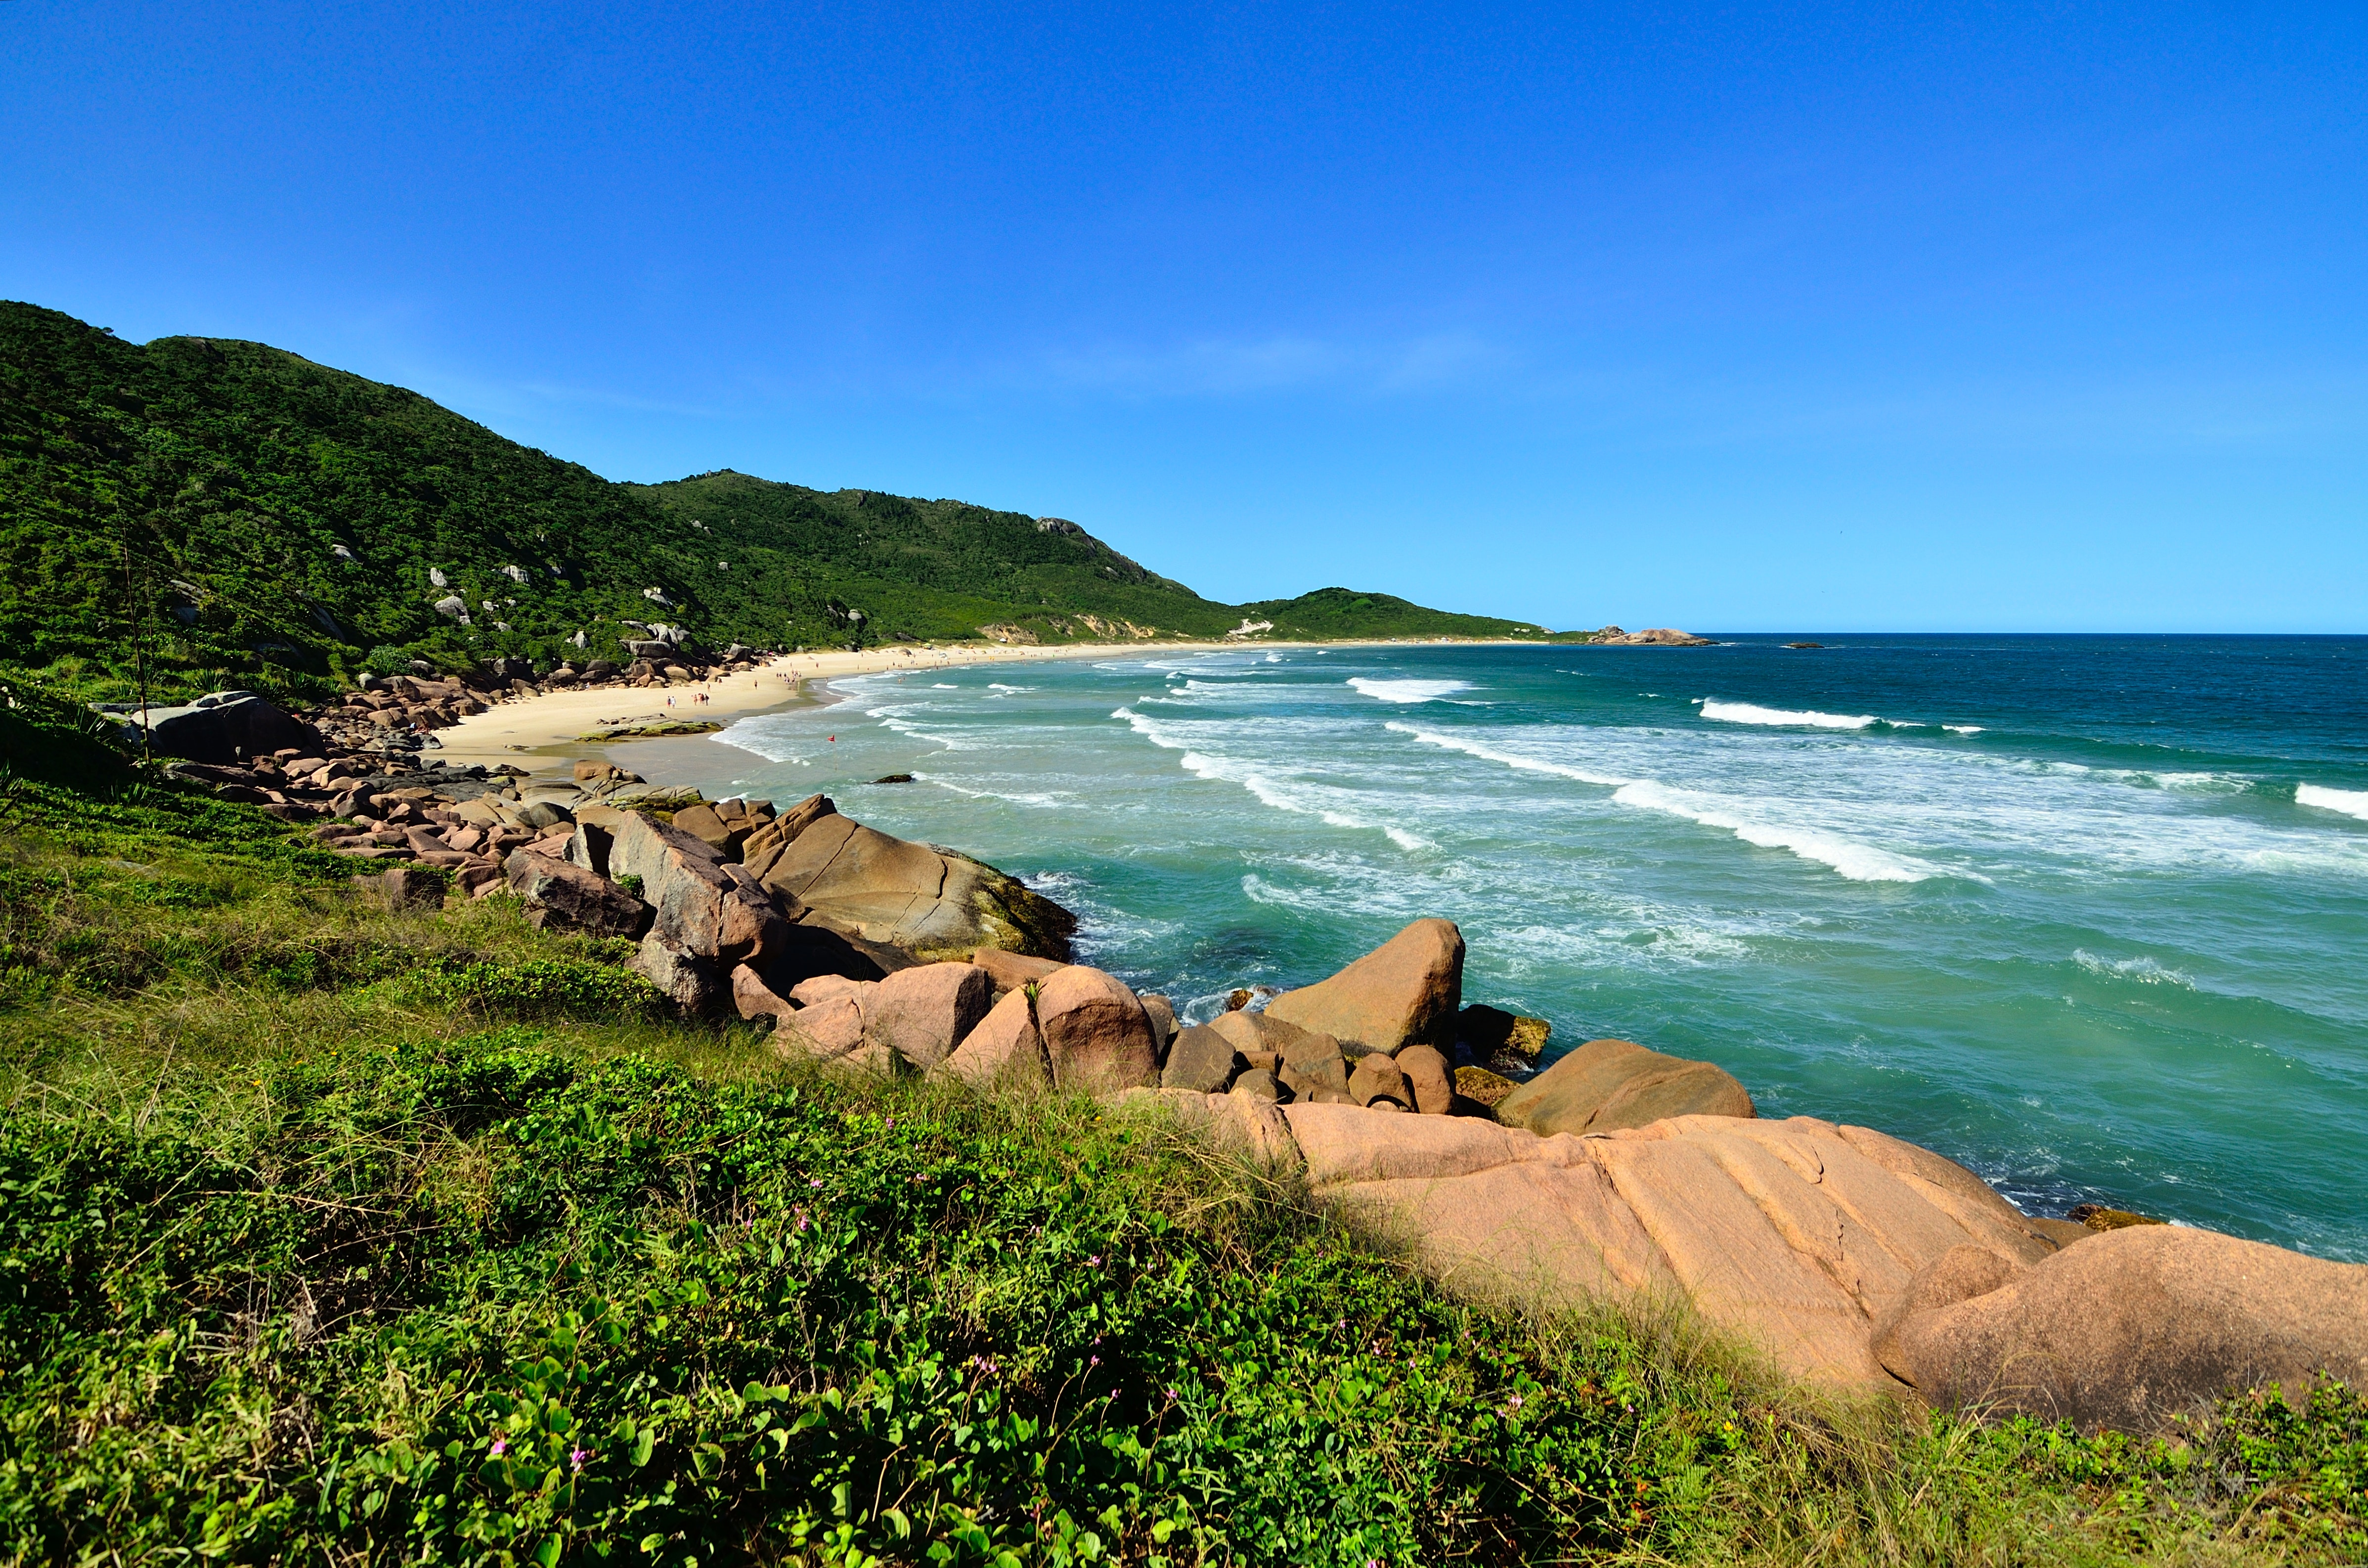 beach-island-landscape-155246